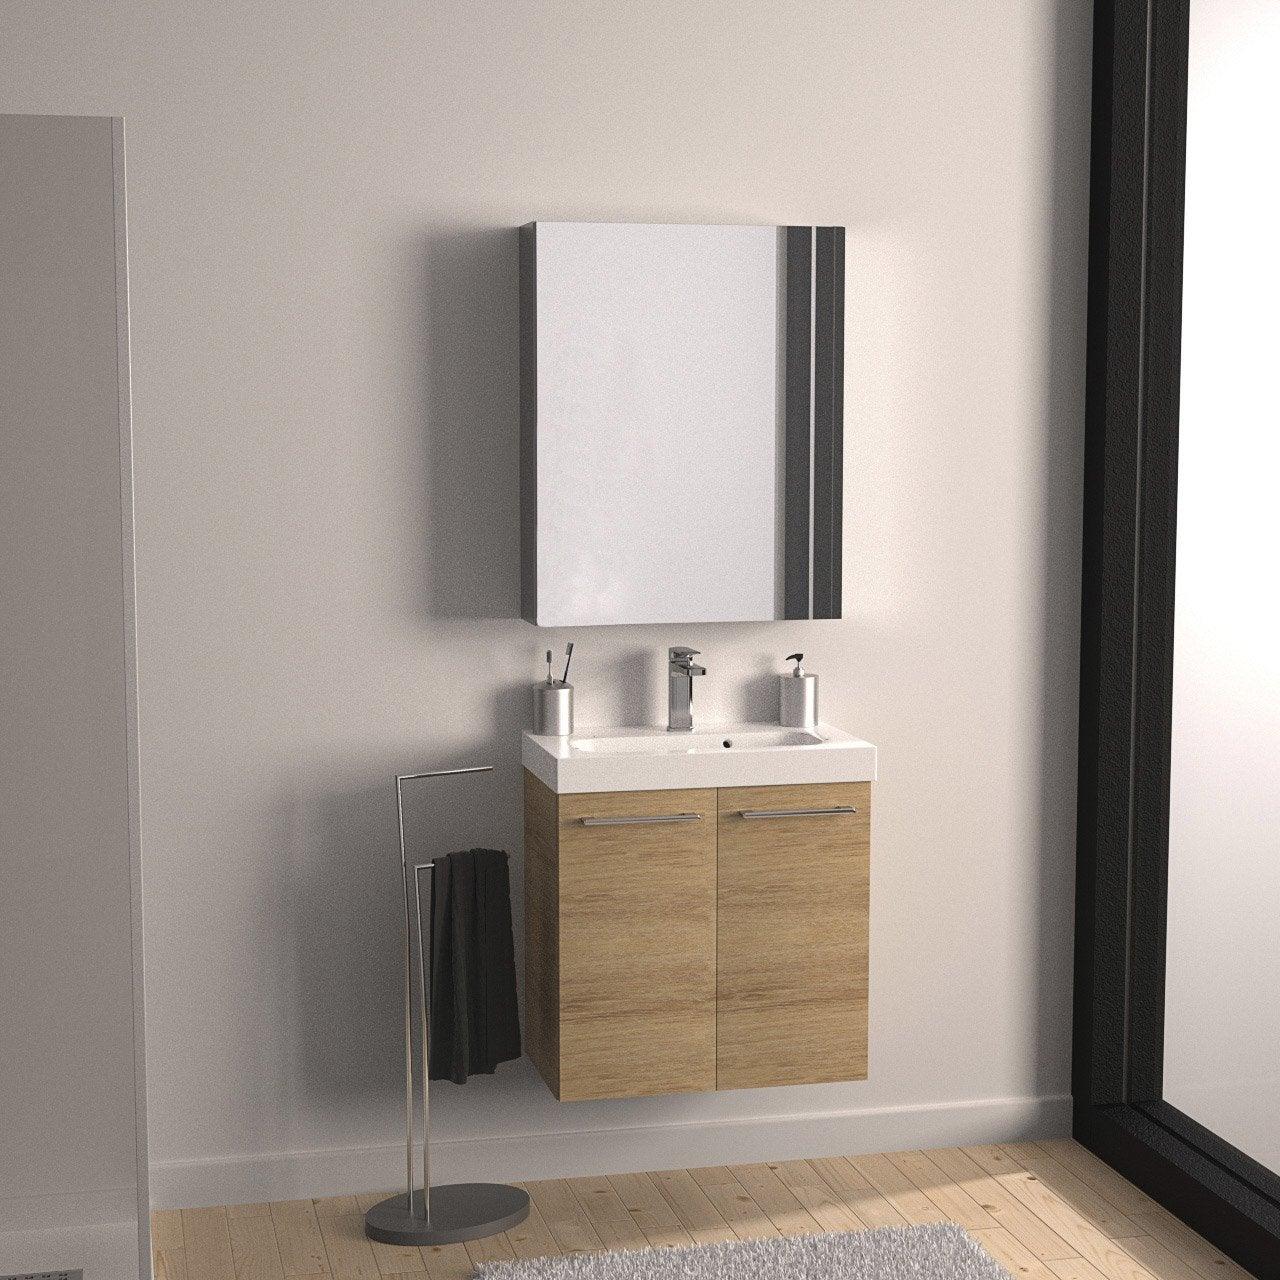 Meuble vasque 61 cm décor imitation chªne clair Remix